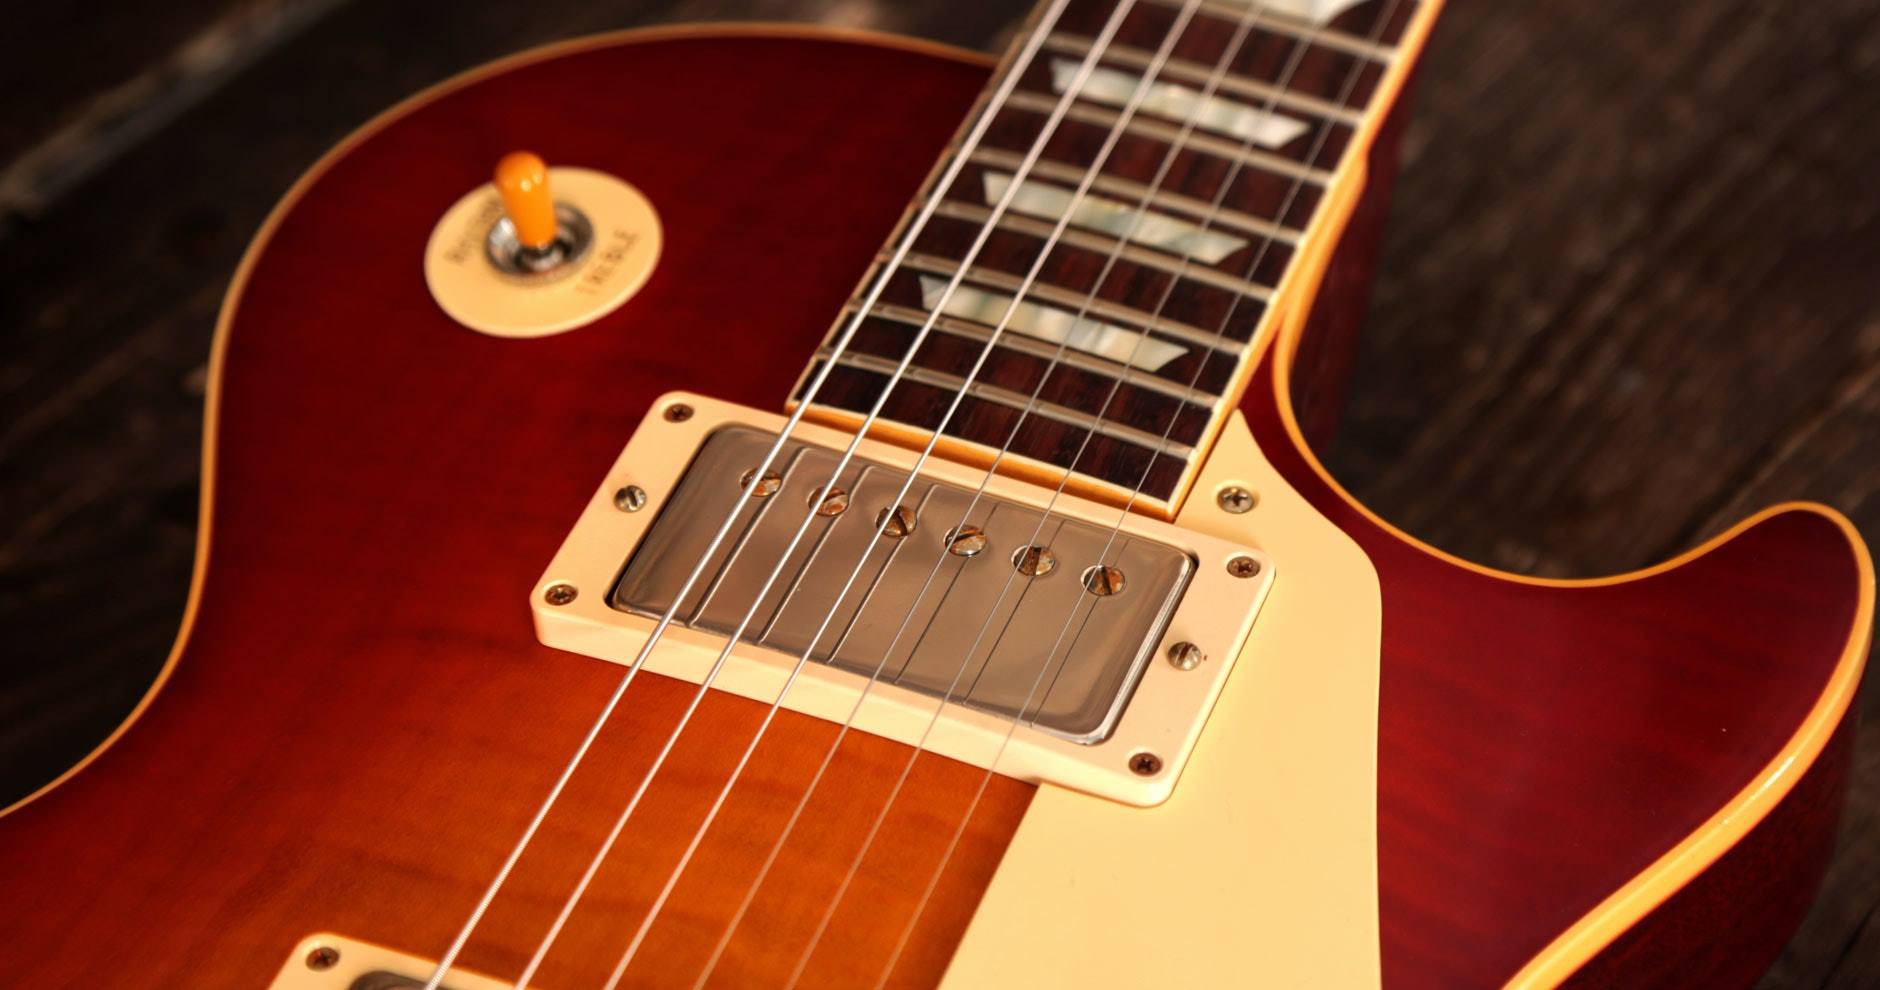 Guitar Wiring Diagrams Further Guitar Wiring Diagrams 3 Pickups